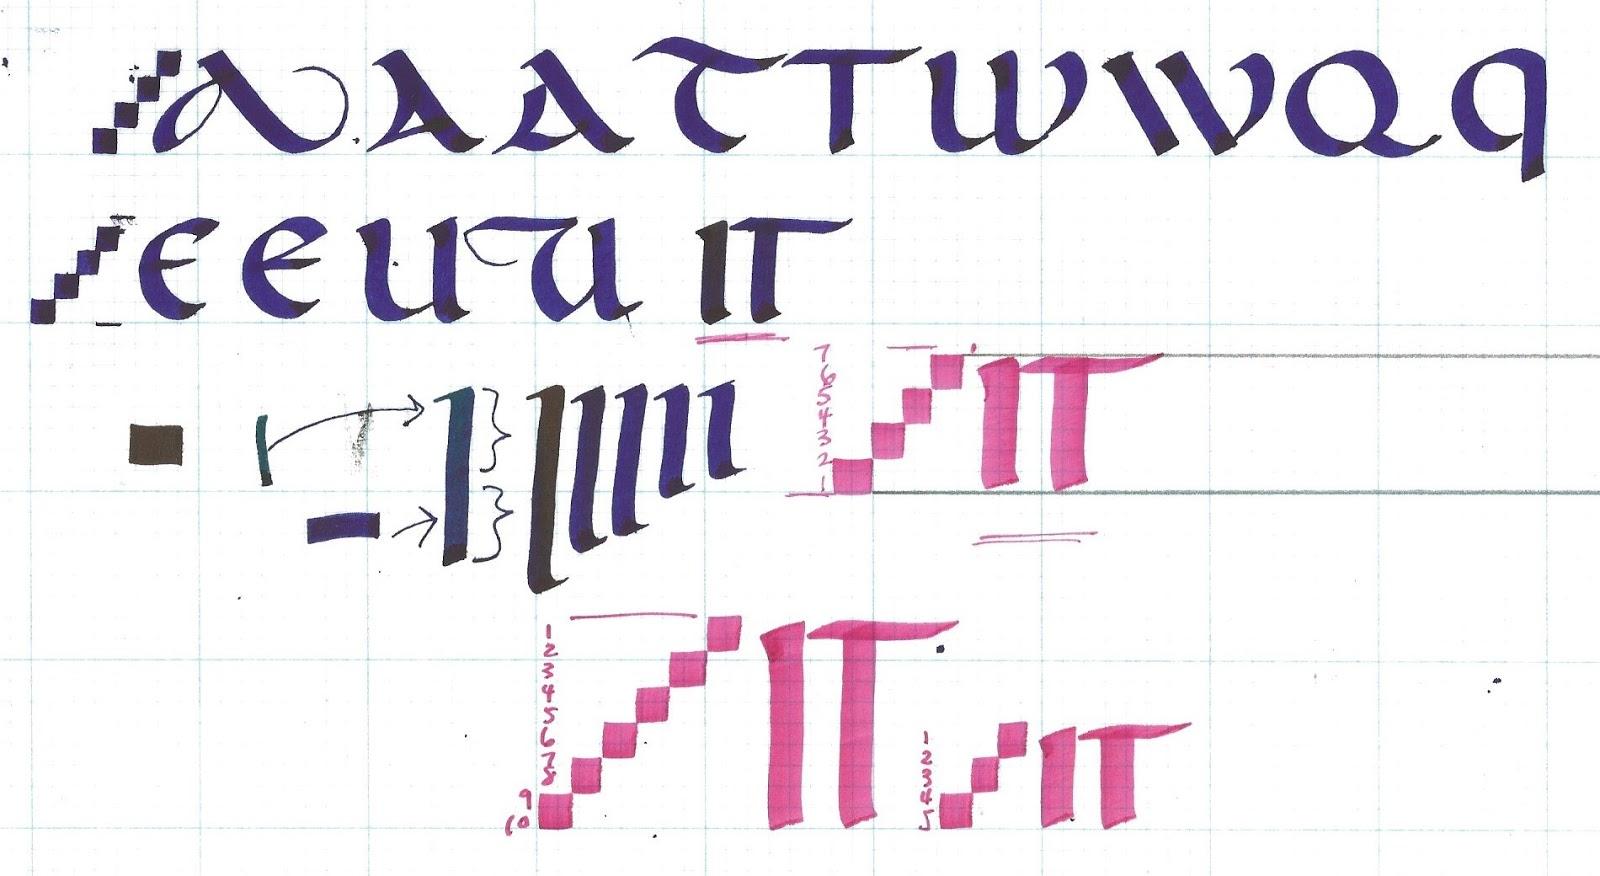 Kerrlligraphy Practicing Uncial